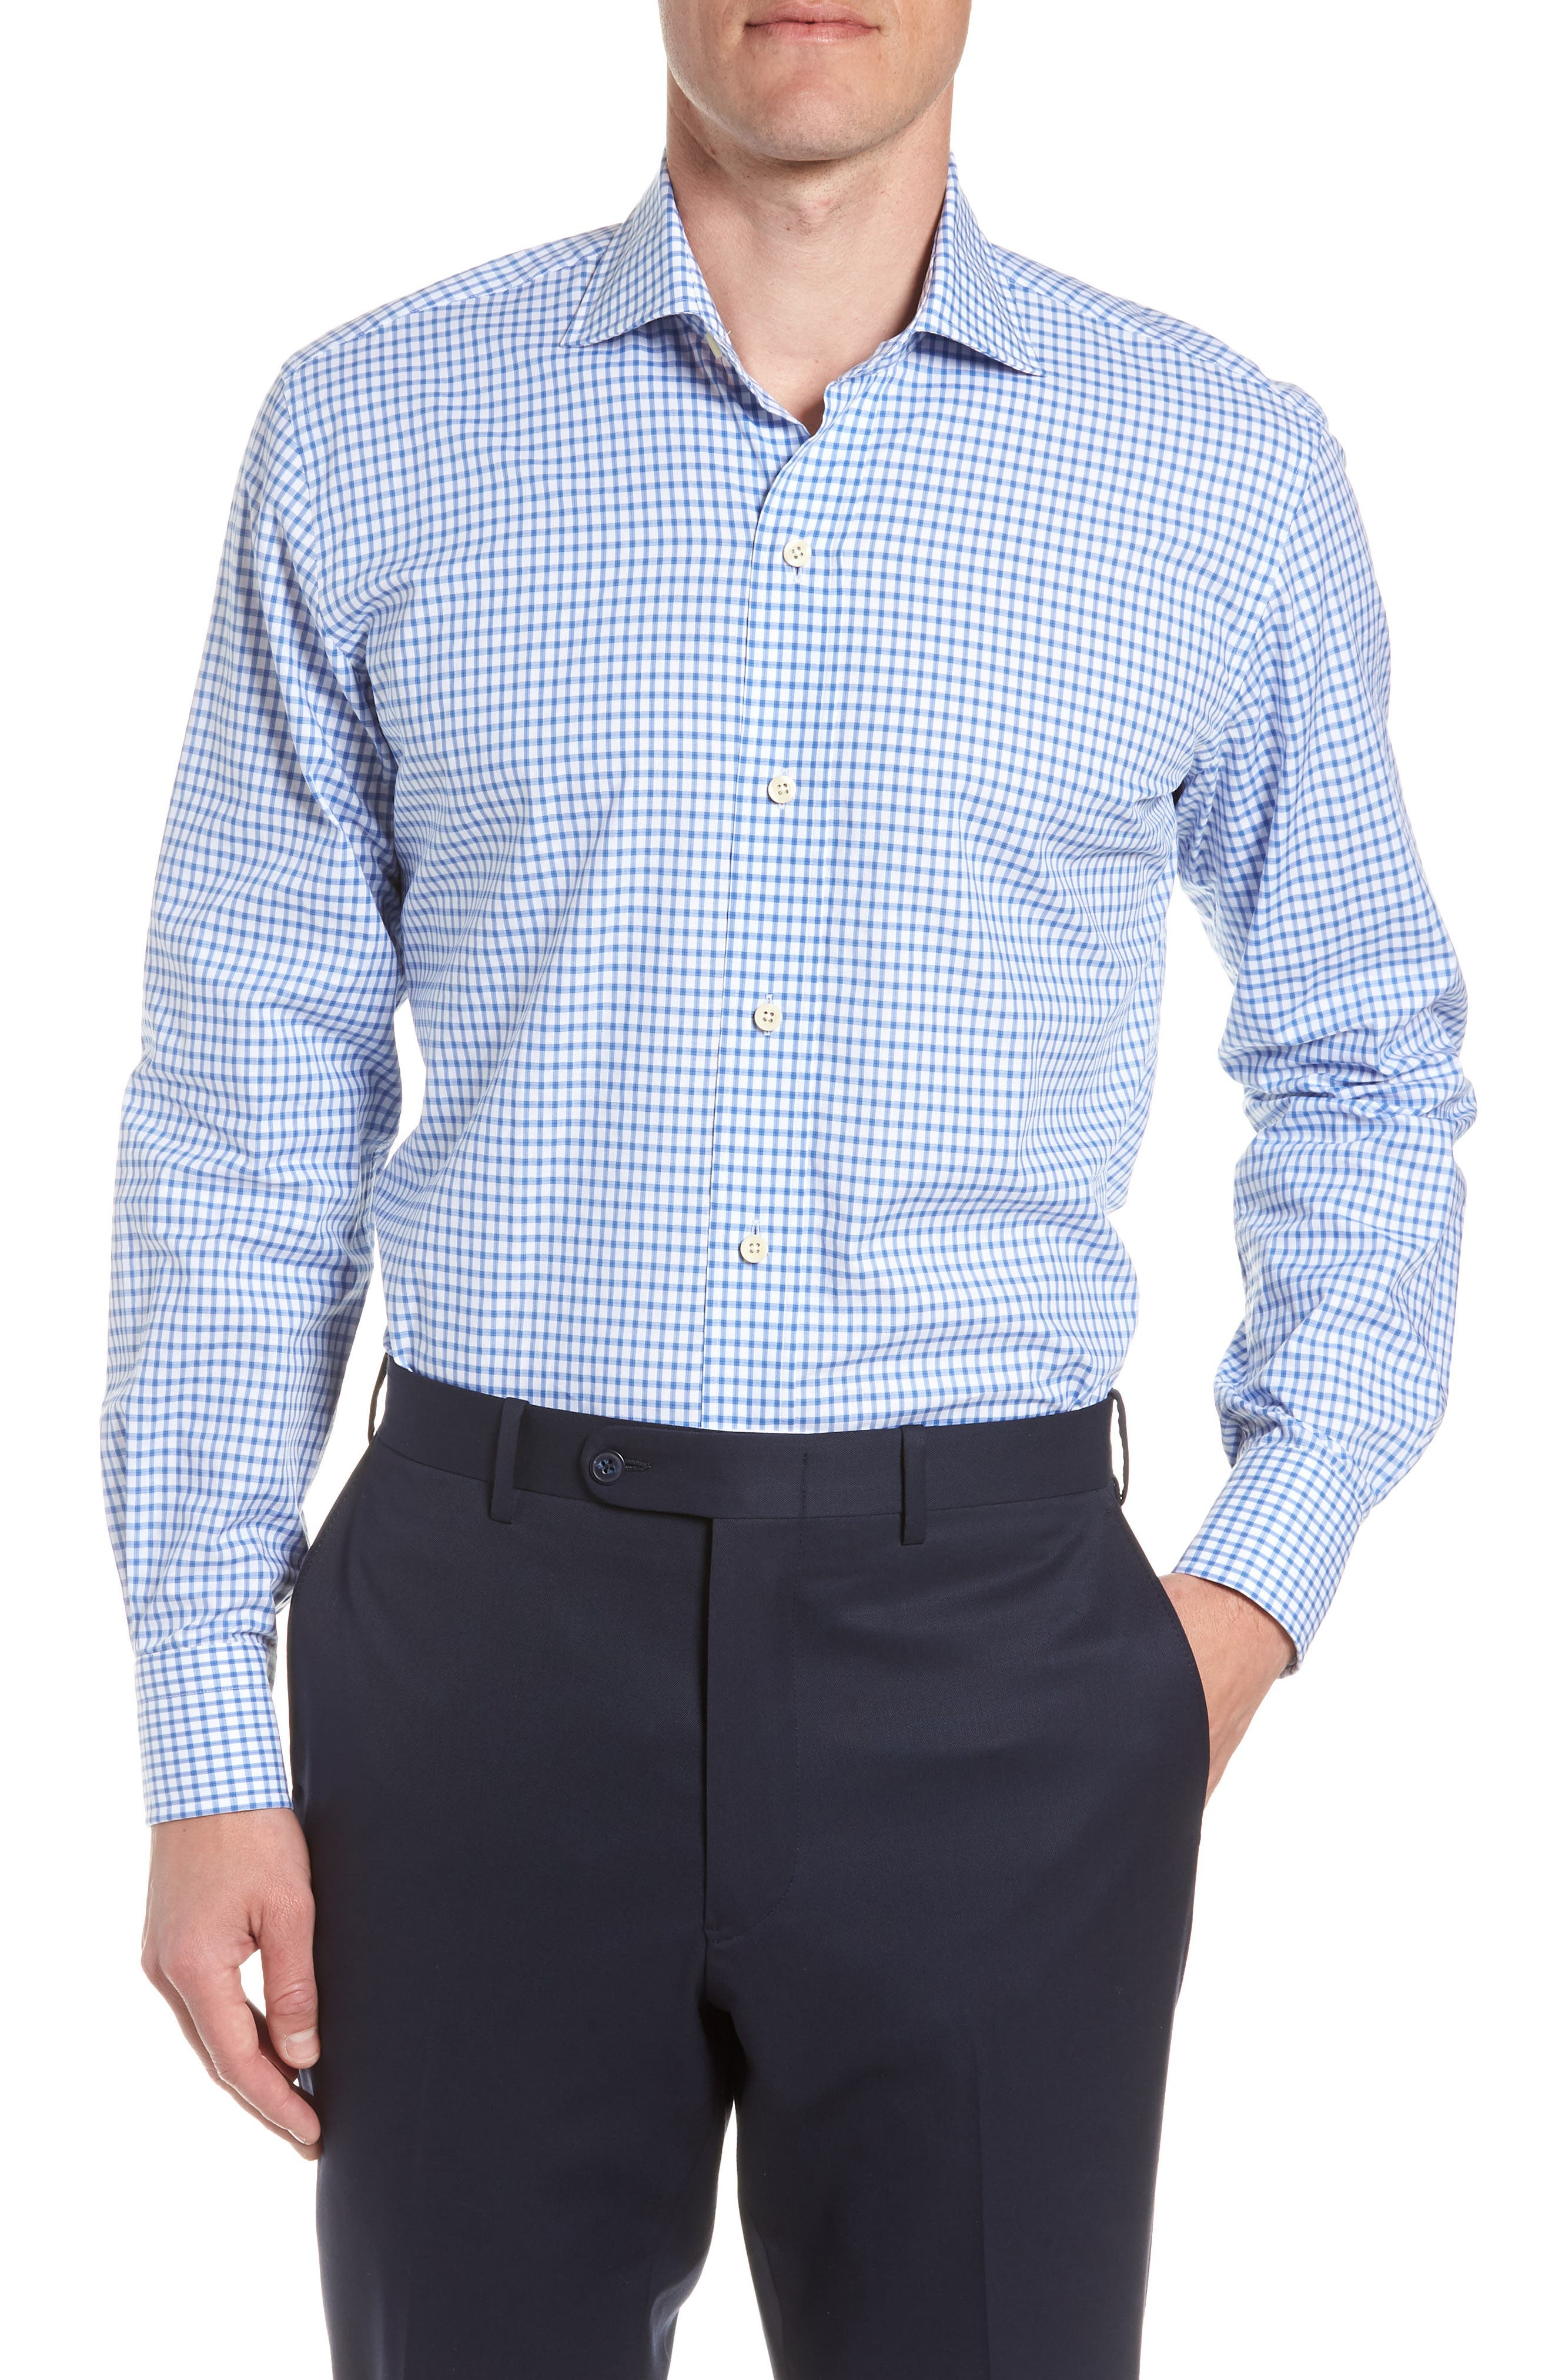 Garrison Slim Fit Check Dress Shirt,                             Main thumbnail 1, color,